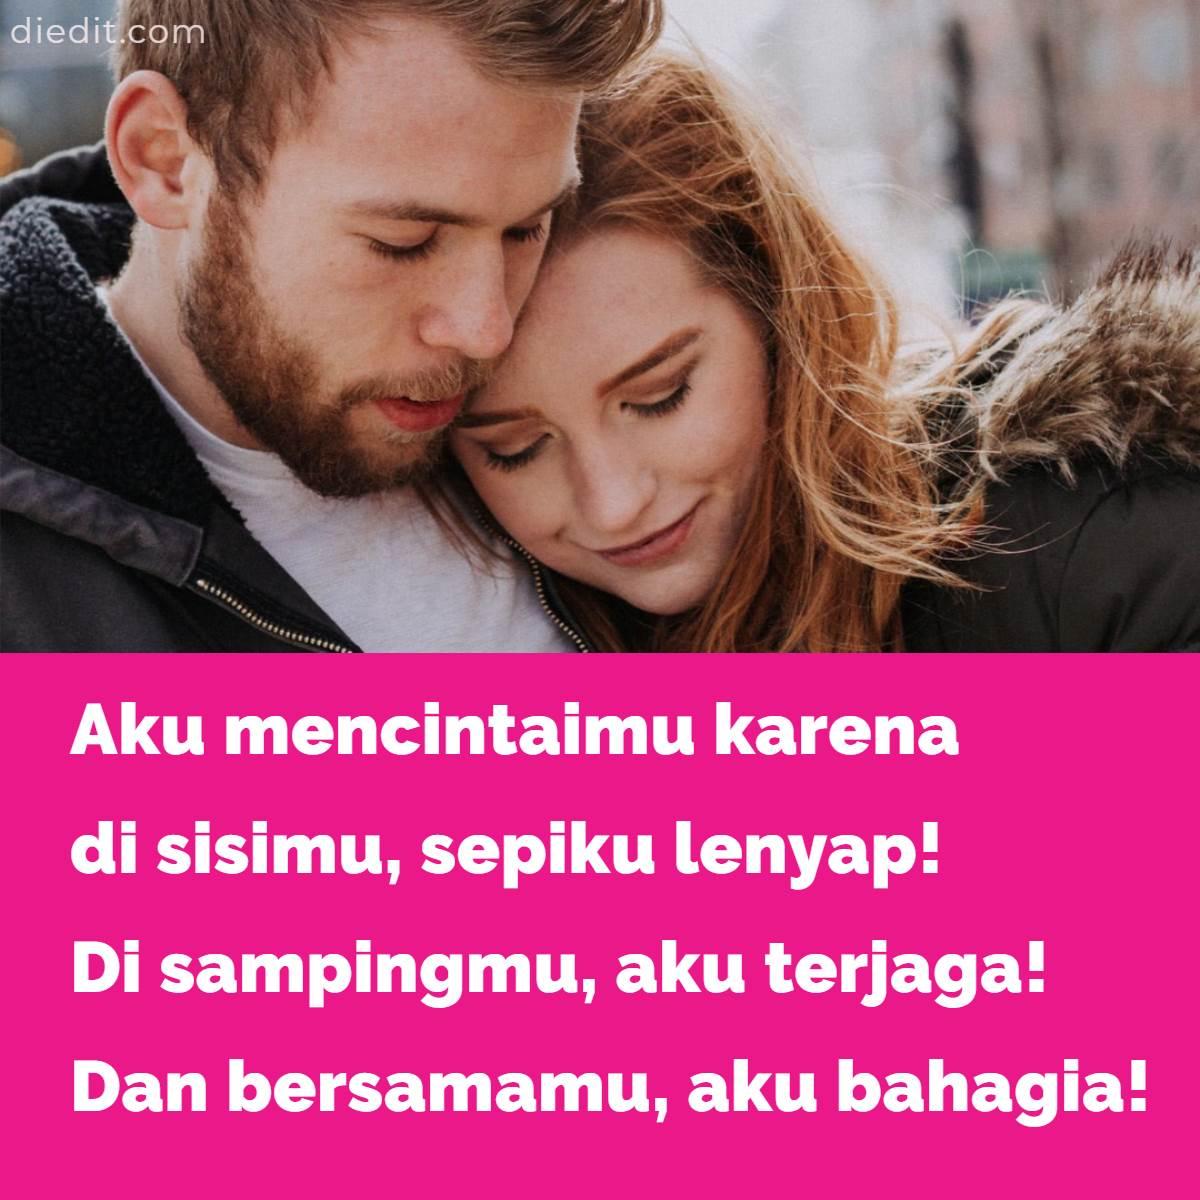 1500+ Kata Kata Sayang Buat Pacar, Bikin Mesra Romantis ~ Diedit.com